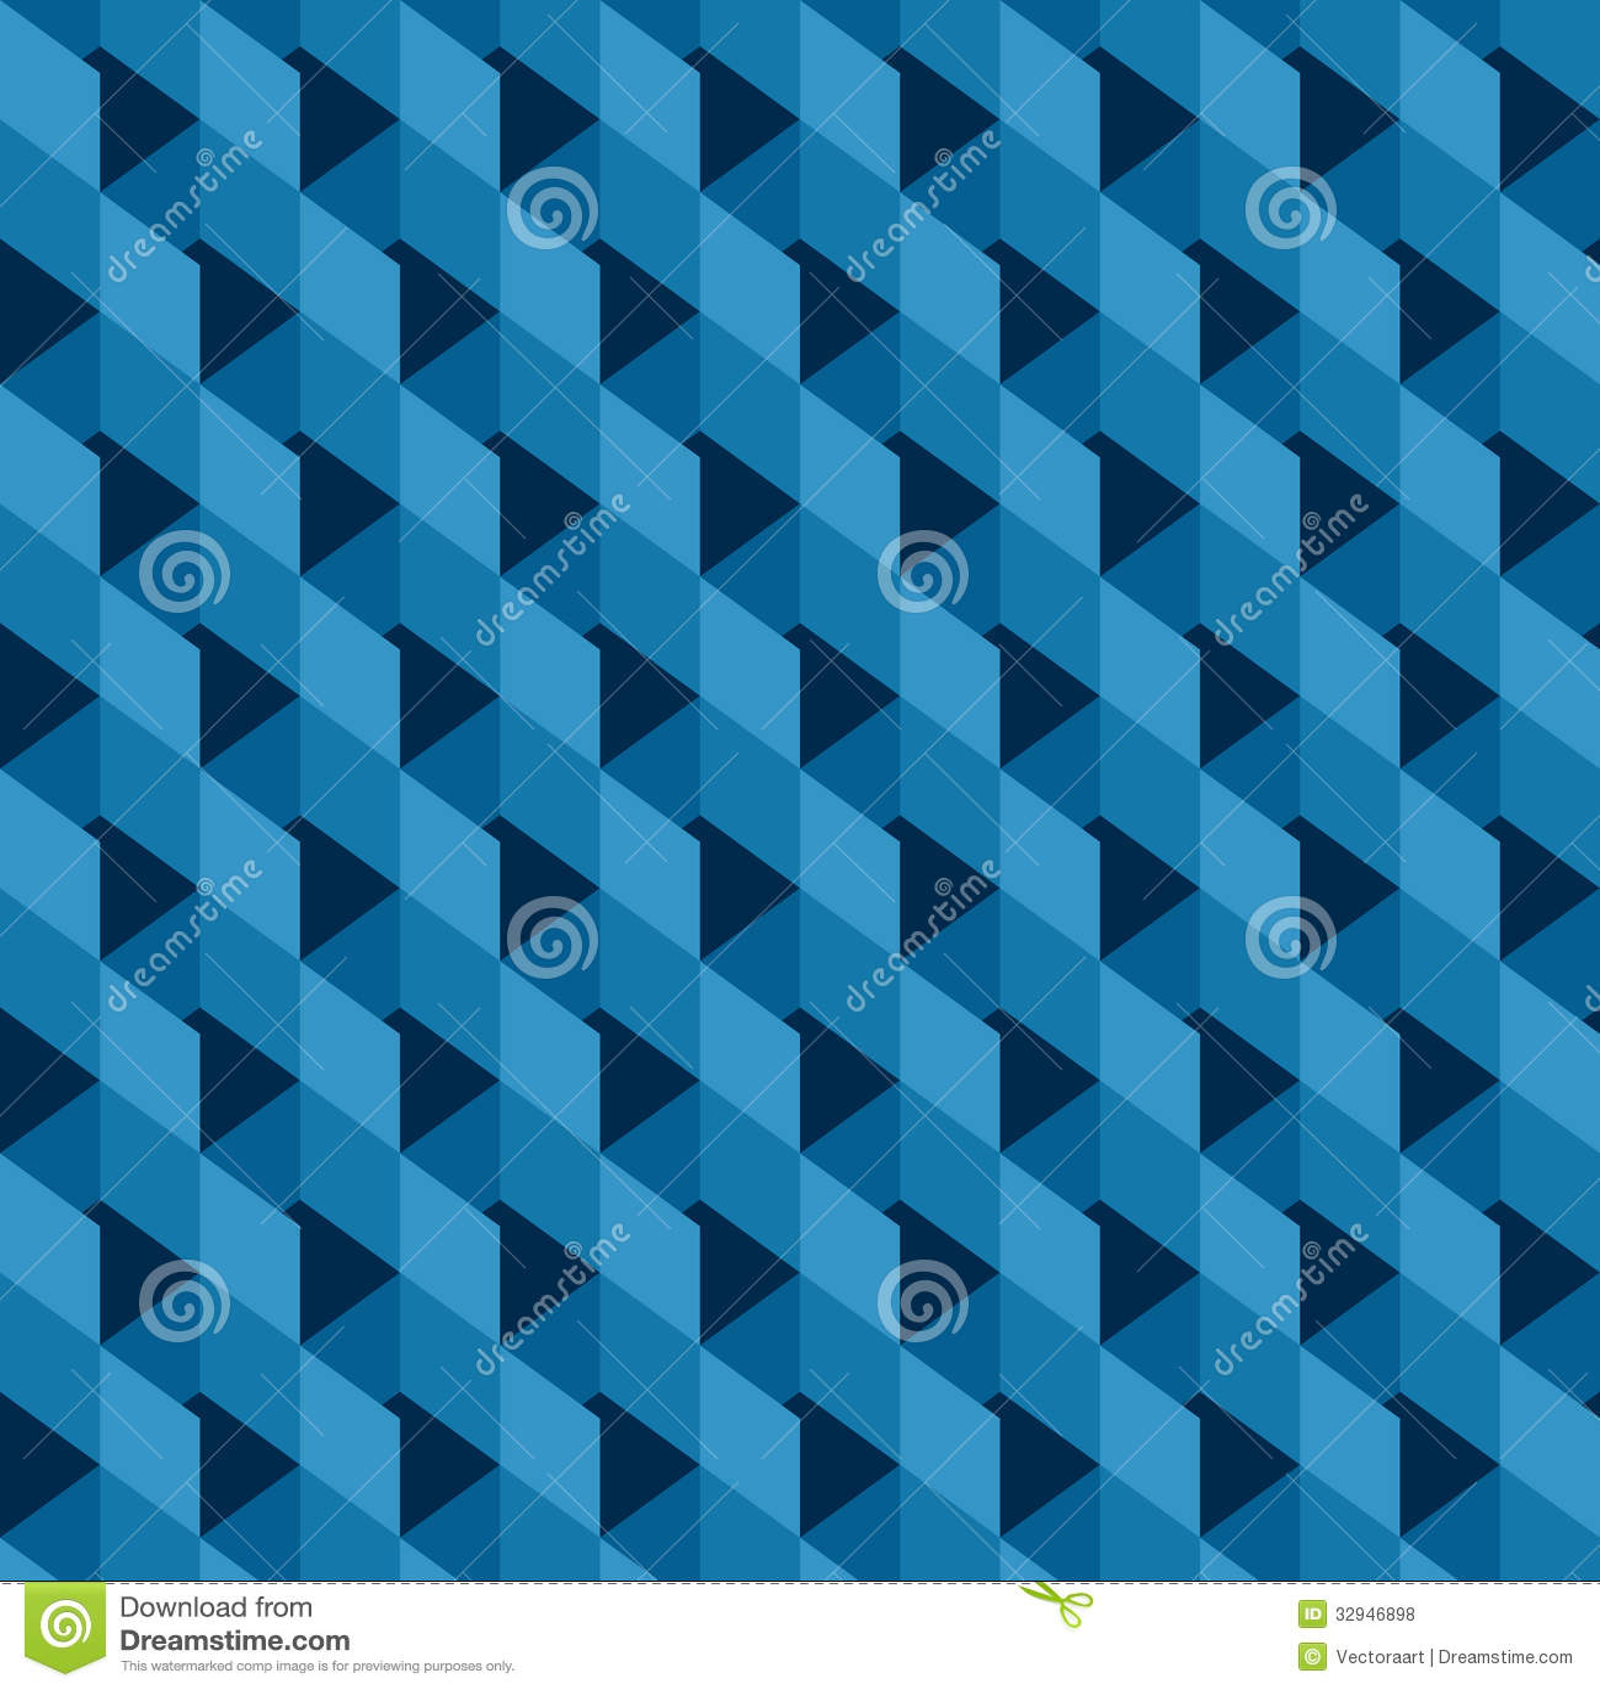 Blue square pattern background - photo#8